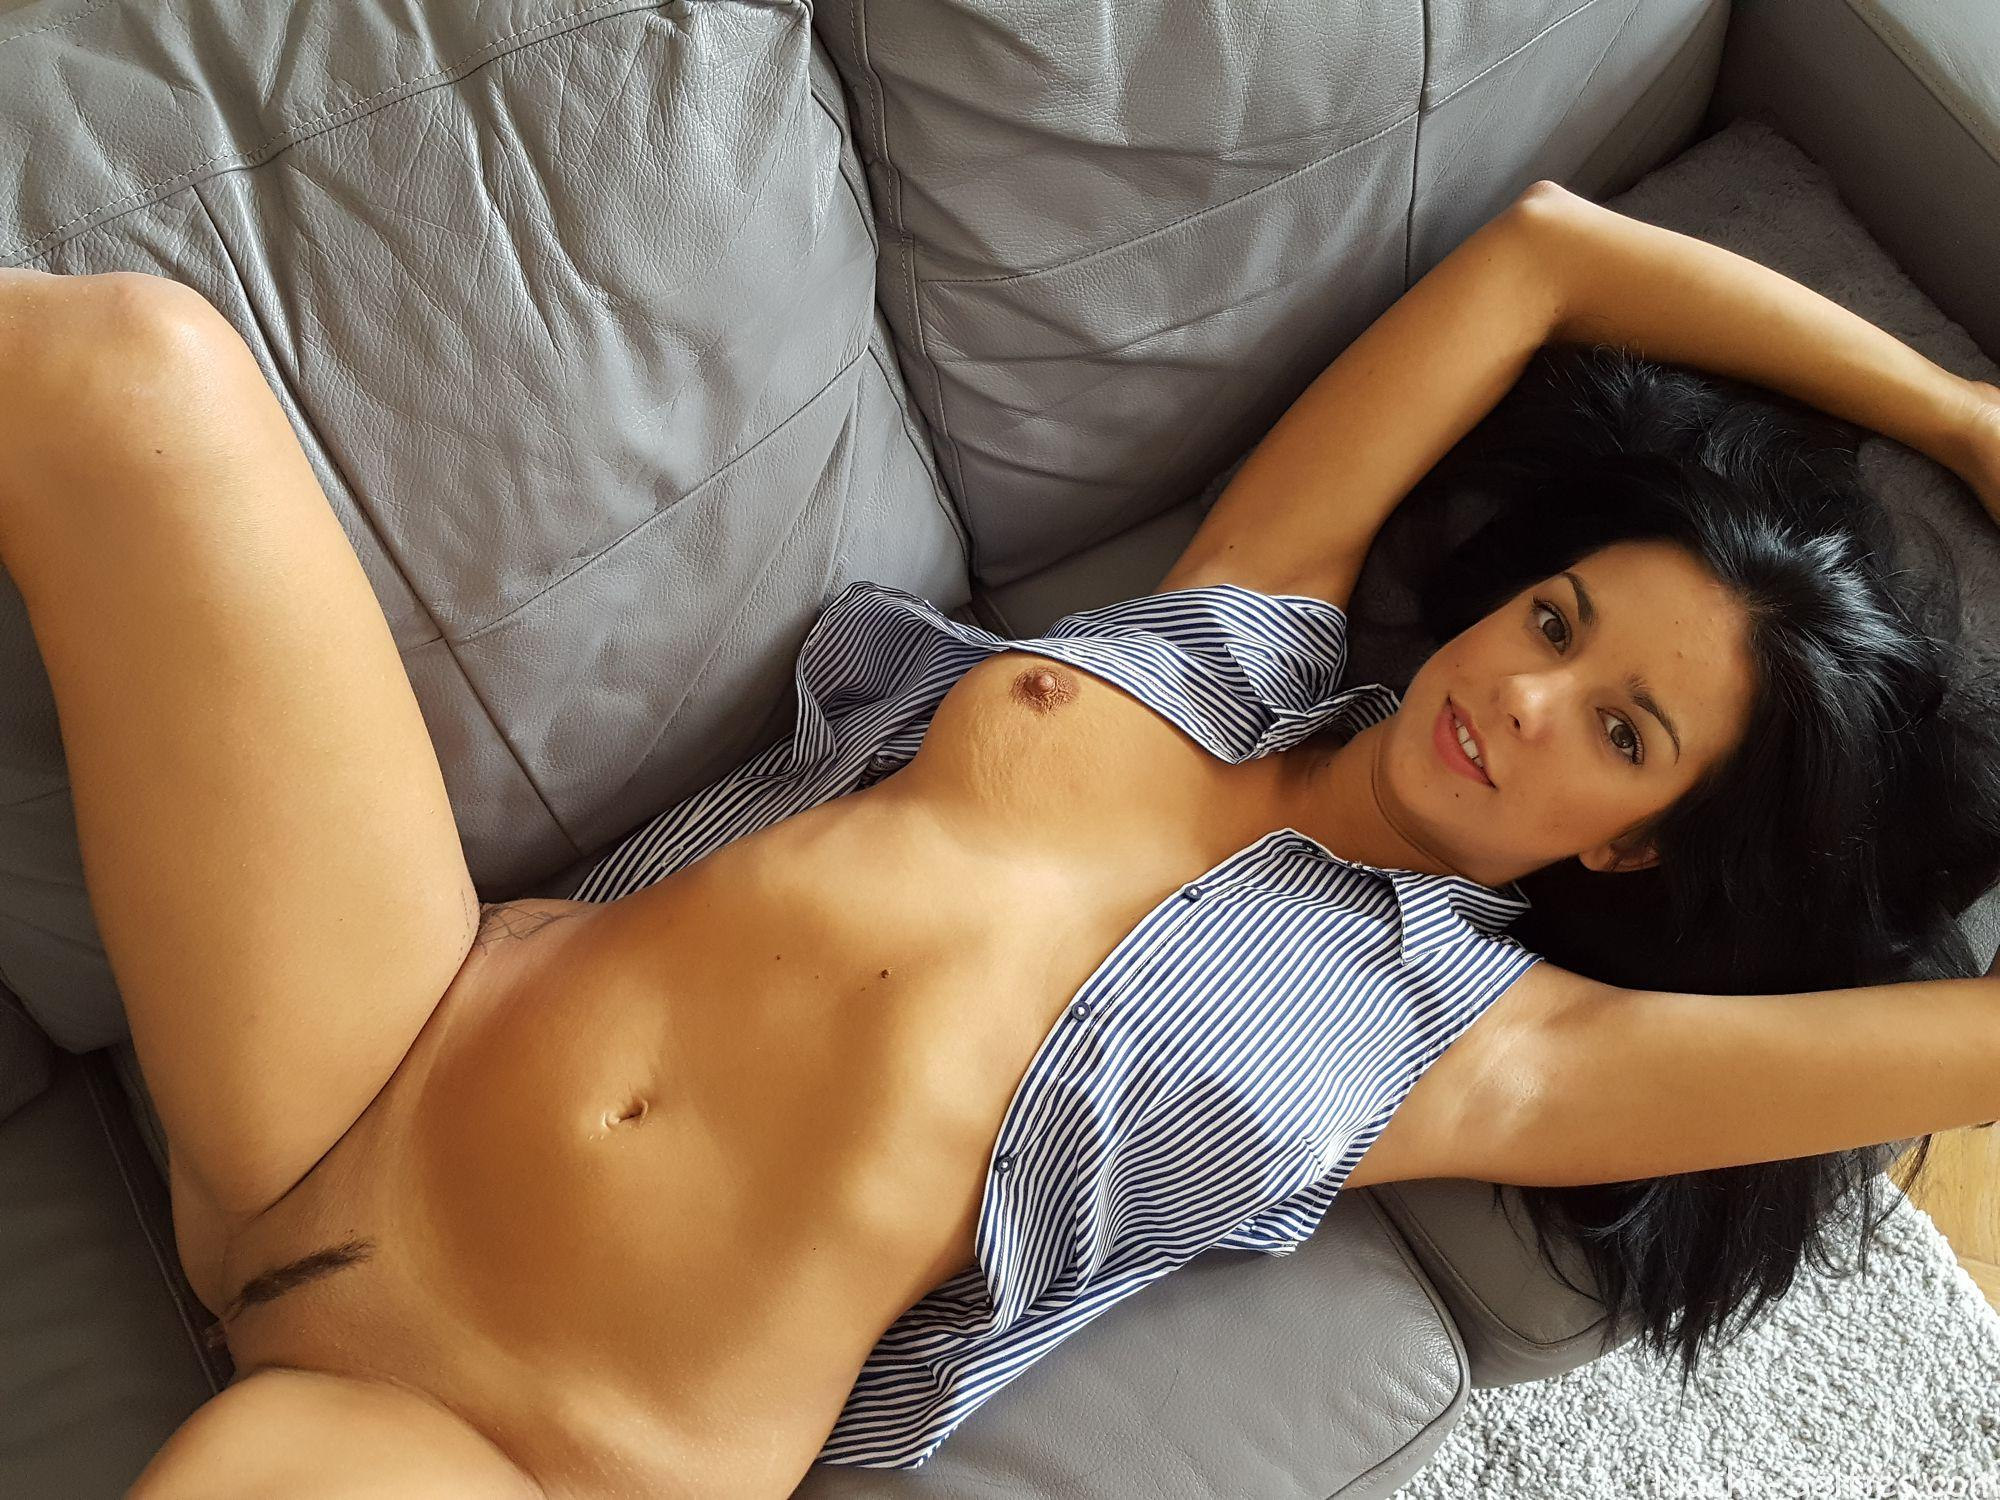 Privates Nacktbild Angelique nackt-selfies.com 02